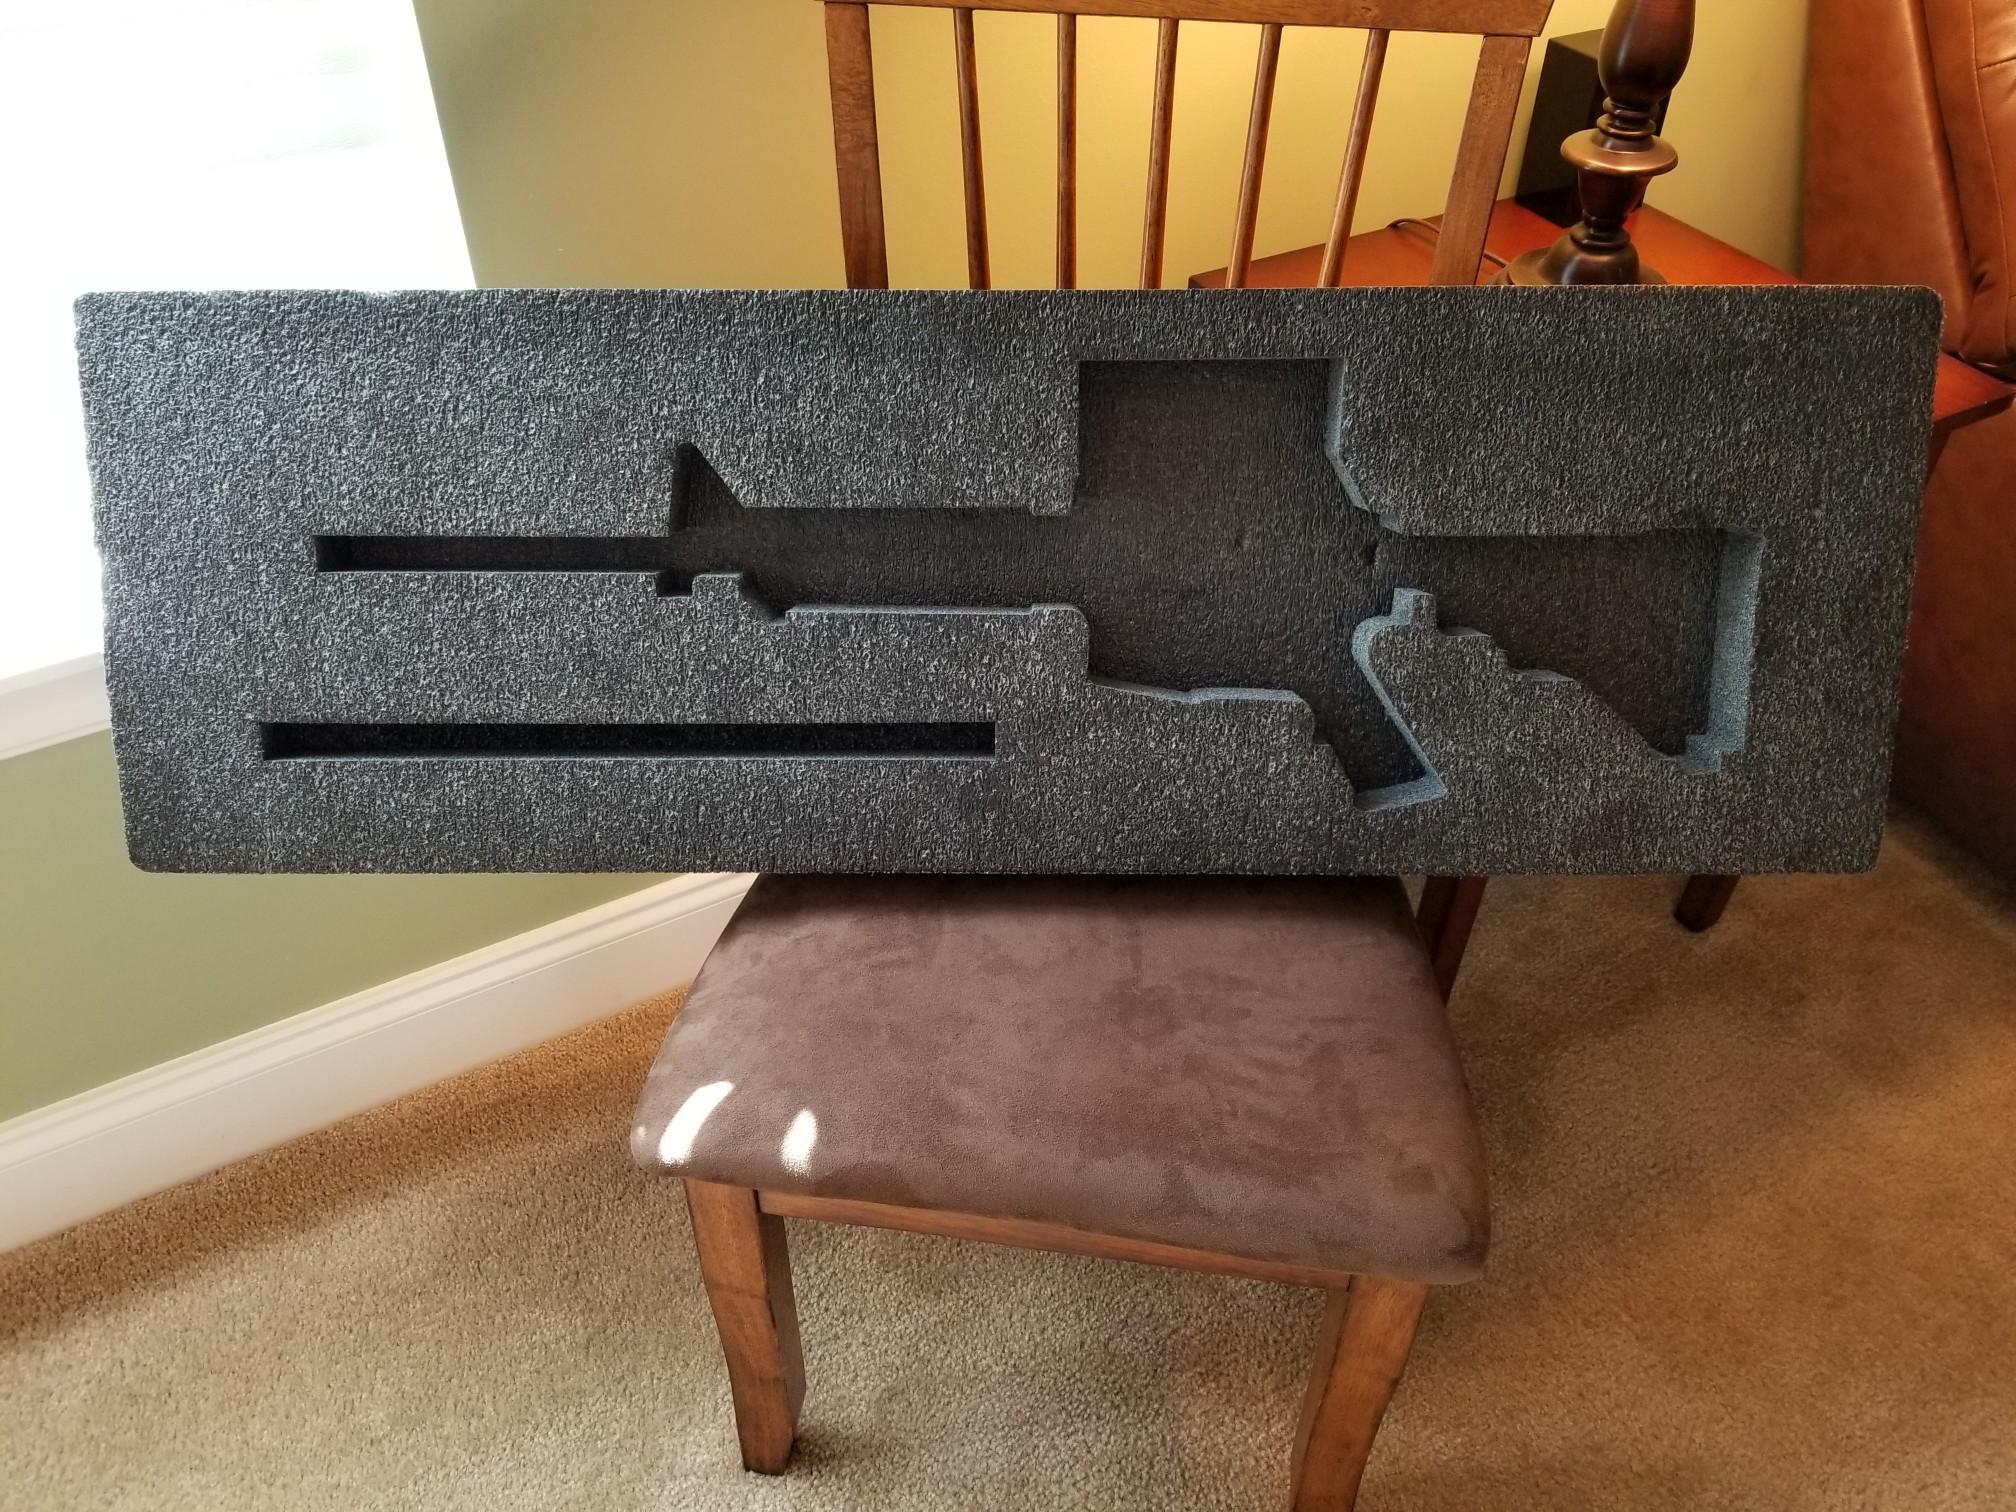 Pelican 1720 Laser-Cut Foam Insert for M4 Carbine - The FAL Files